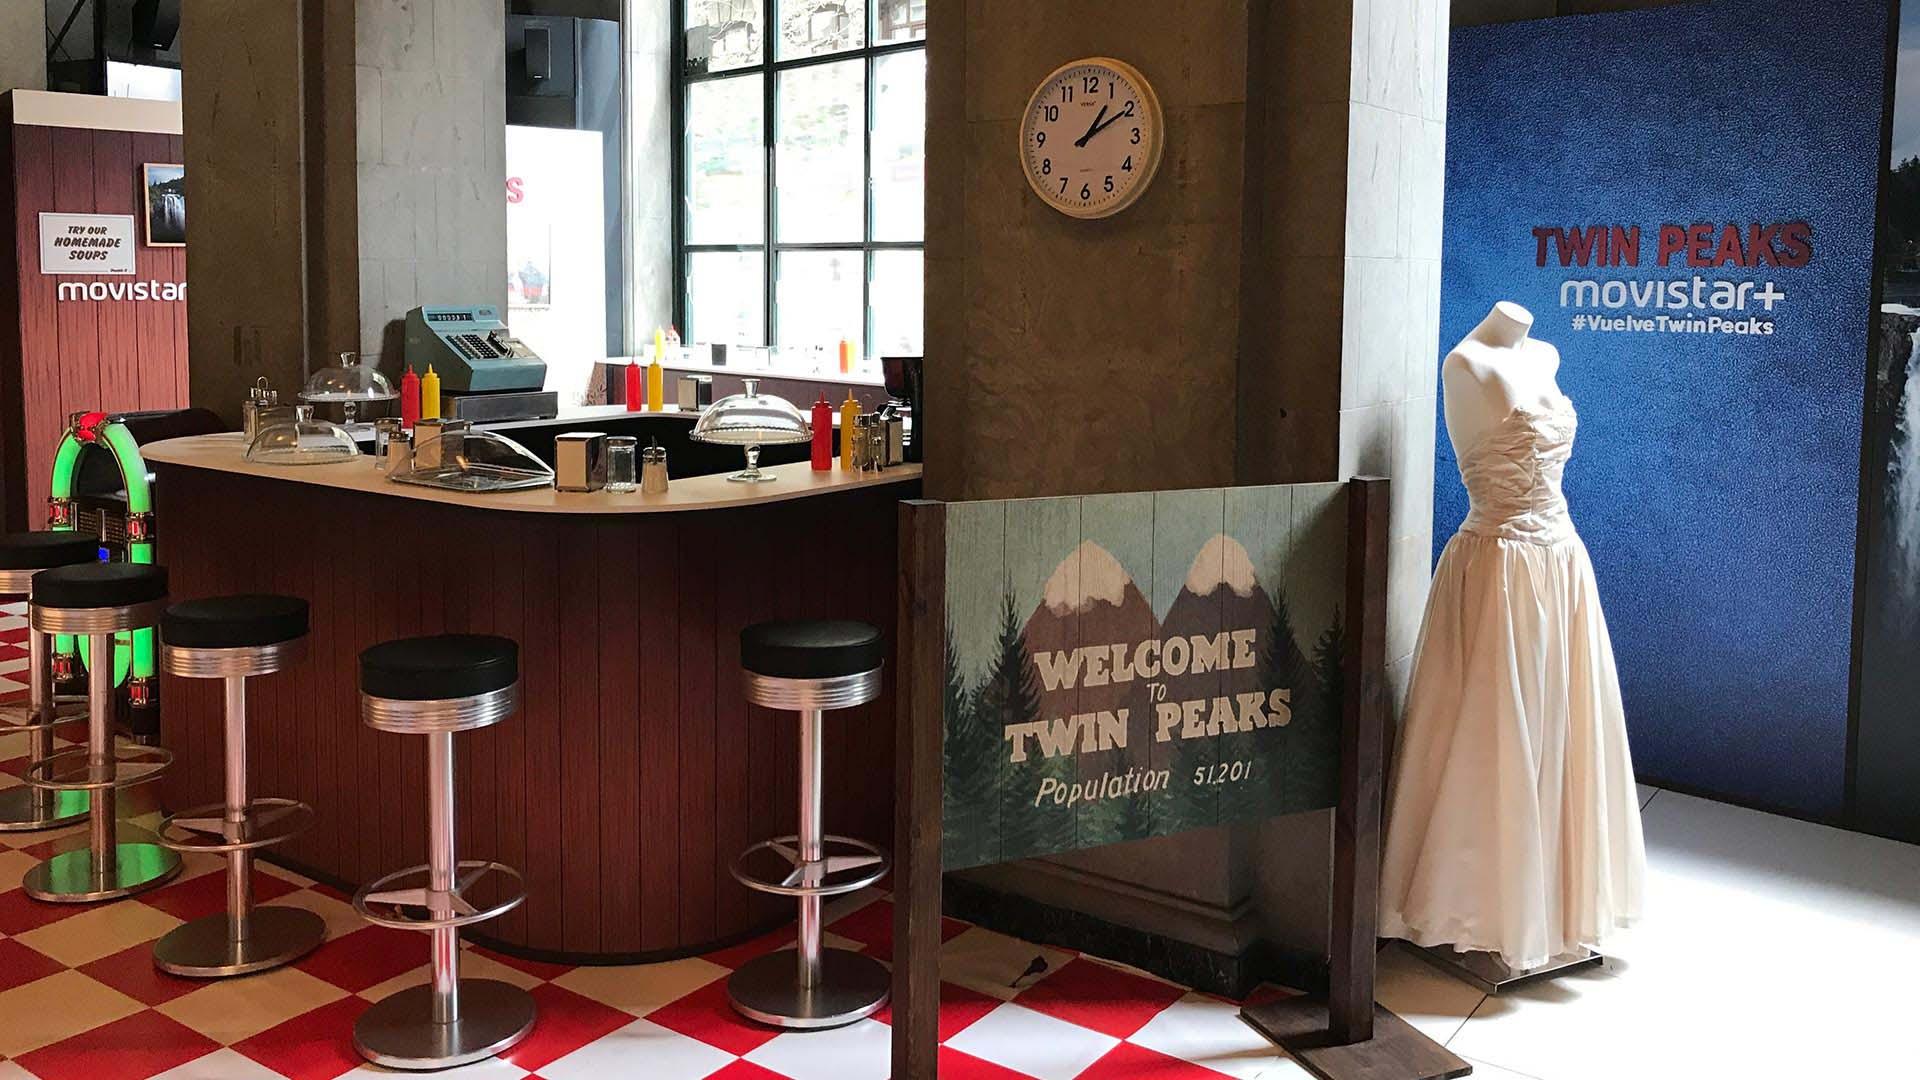 Twin peaks Event presentation. Interior Design